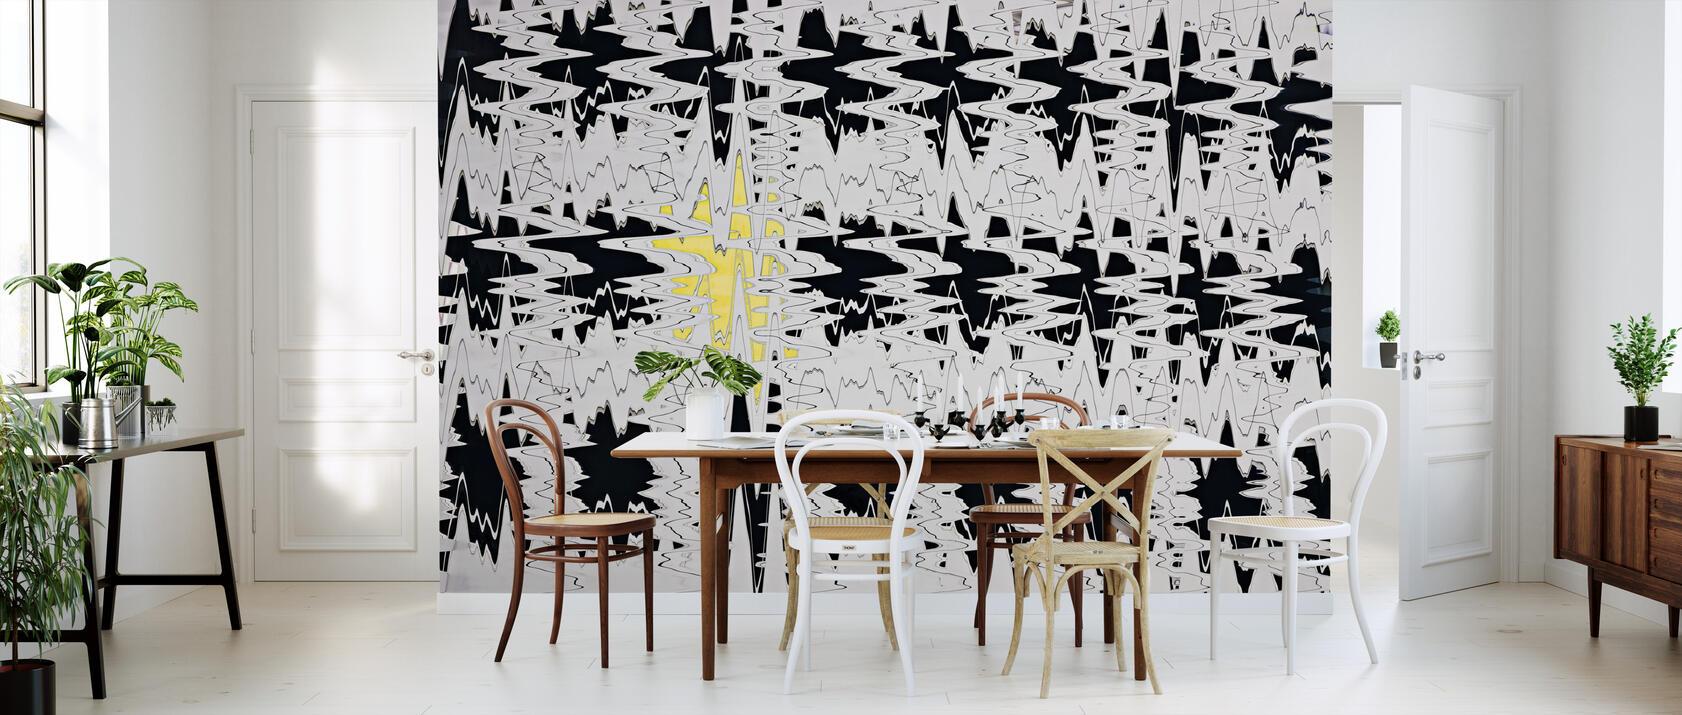 disturbia fototapete nach ma photowall. Black Bedroom Furniture Sets. Home Design Ideas